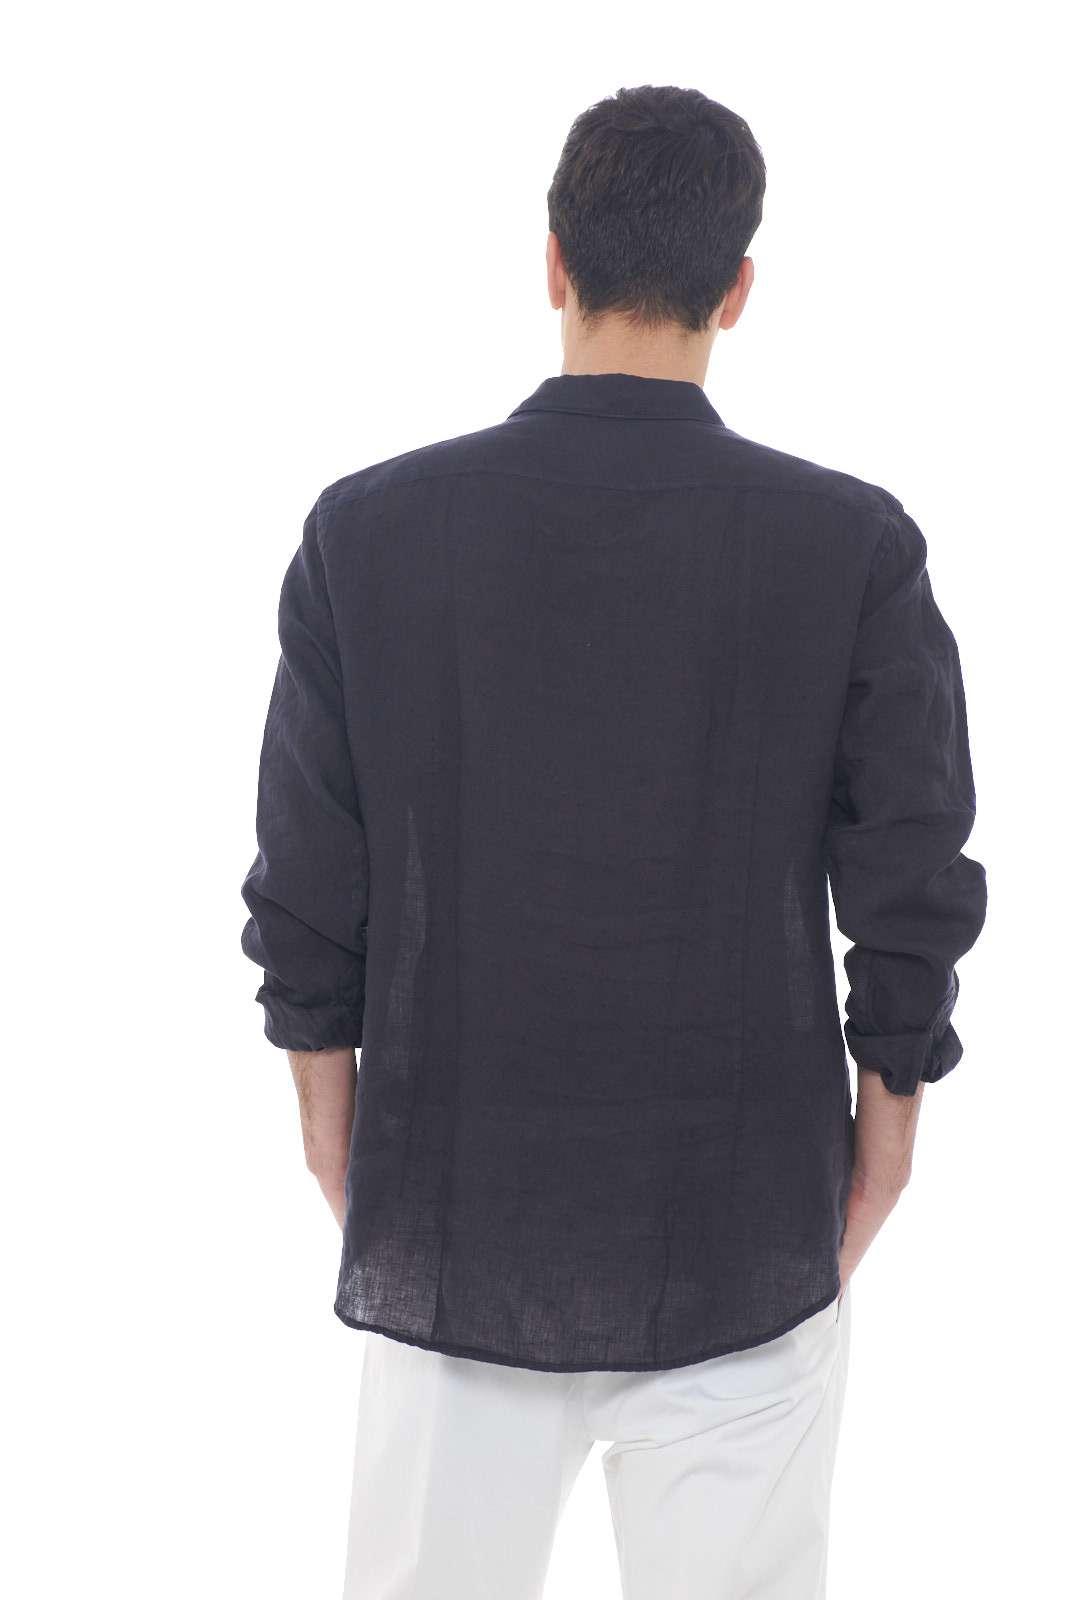 https://www.parmax.com/media/catalog/product/a/i/PE-outlet_parmax-camicia-uomo-Altea-1954000-C_1.jpg